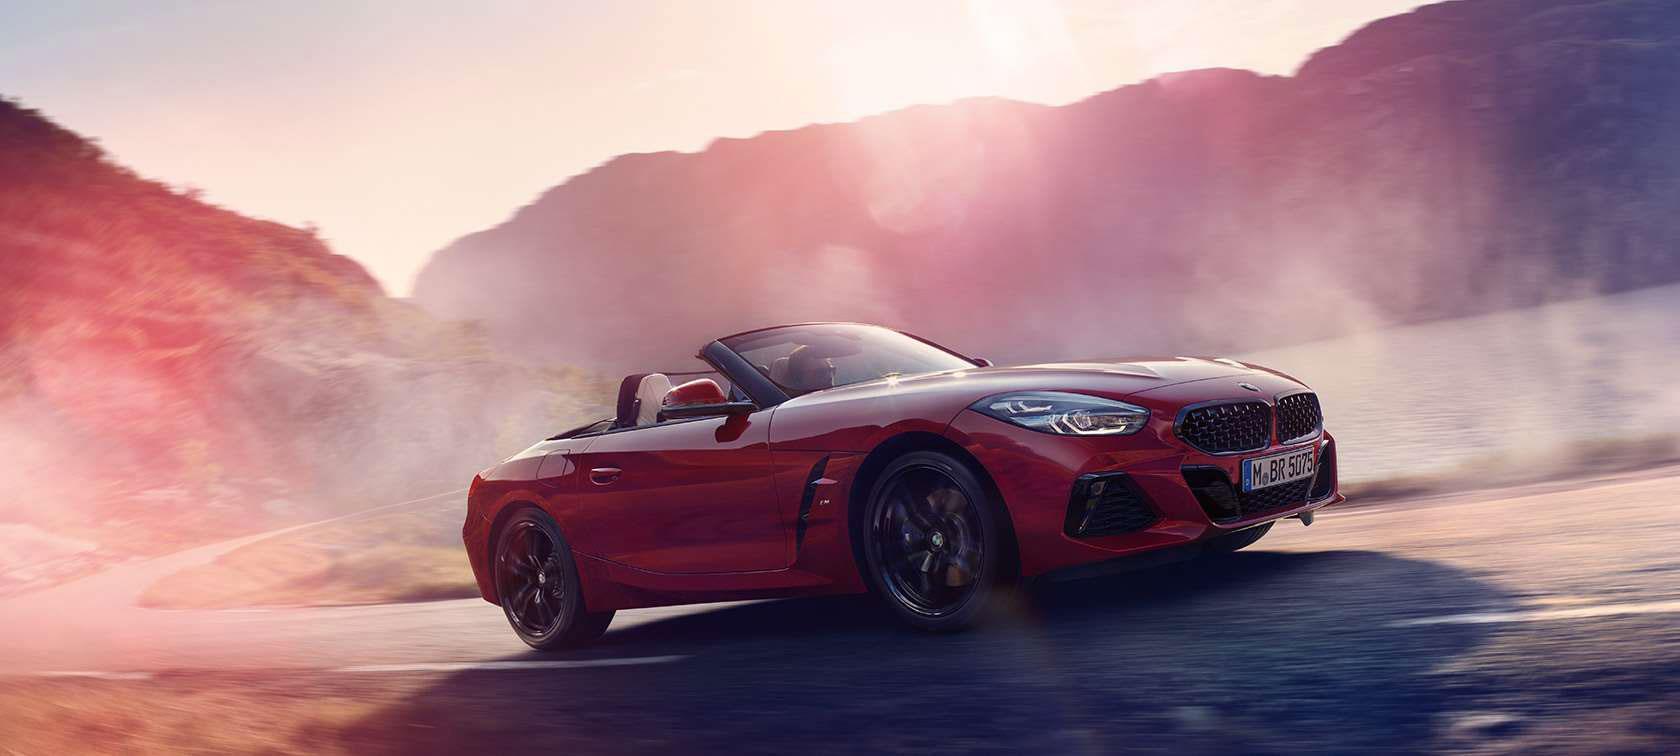 Yeni BMW Z4 Roadster